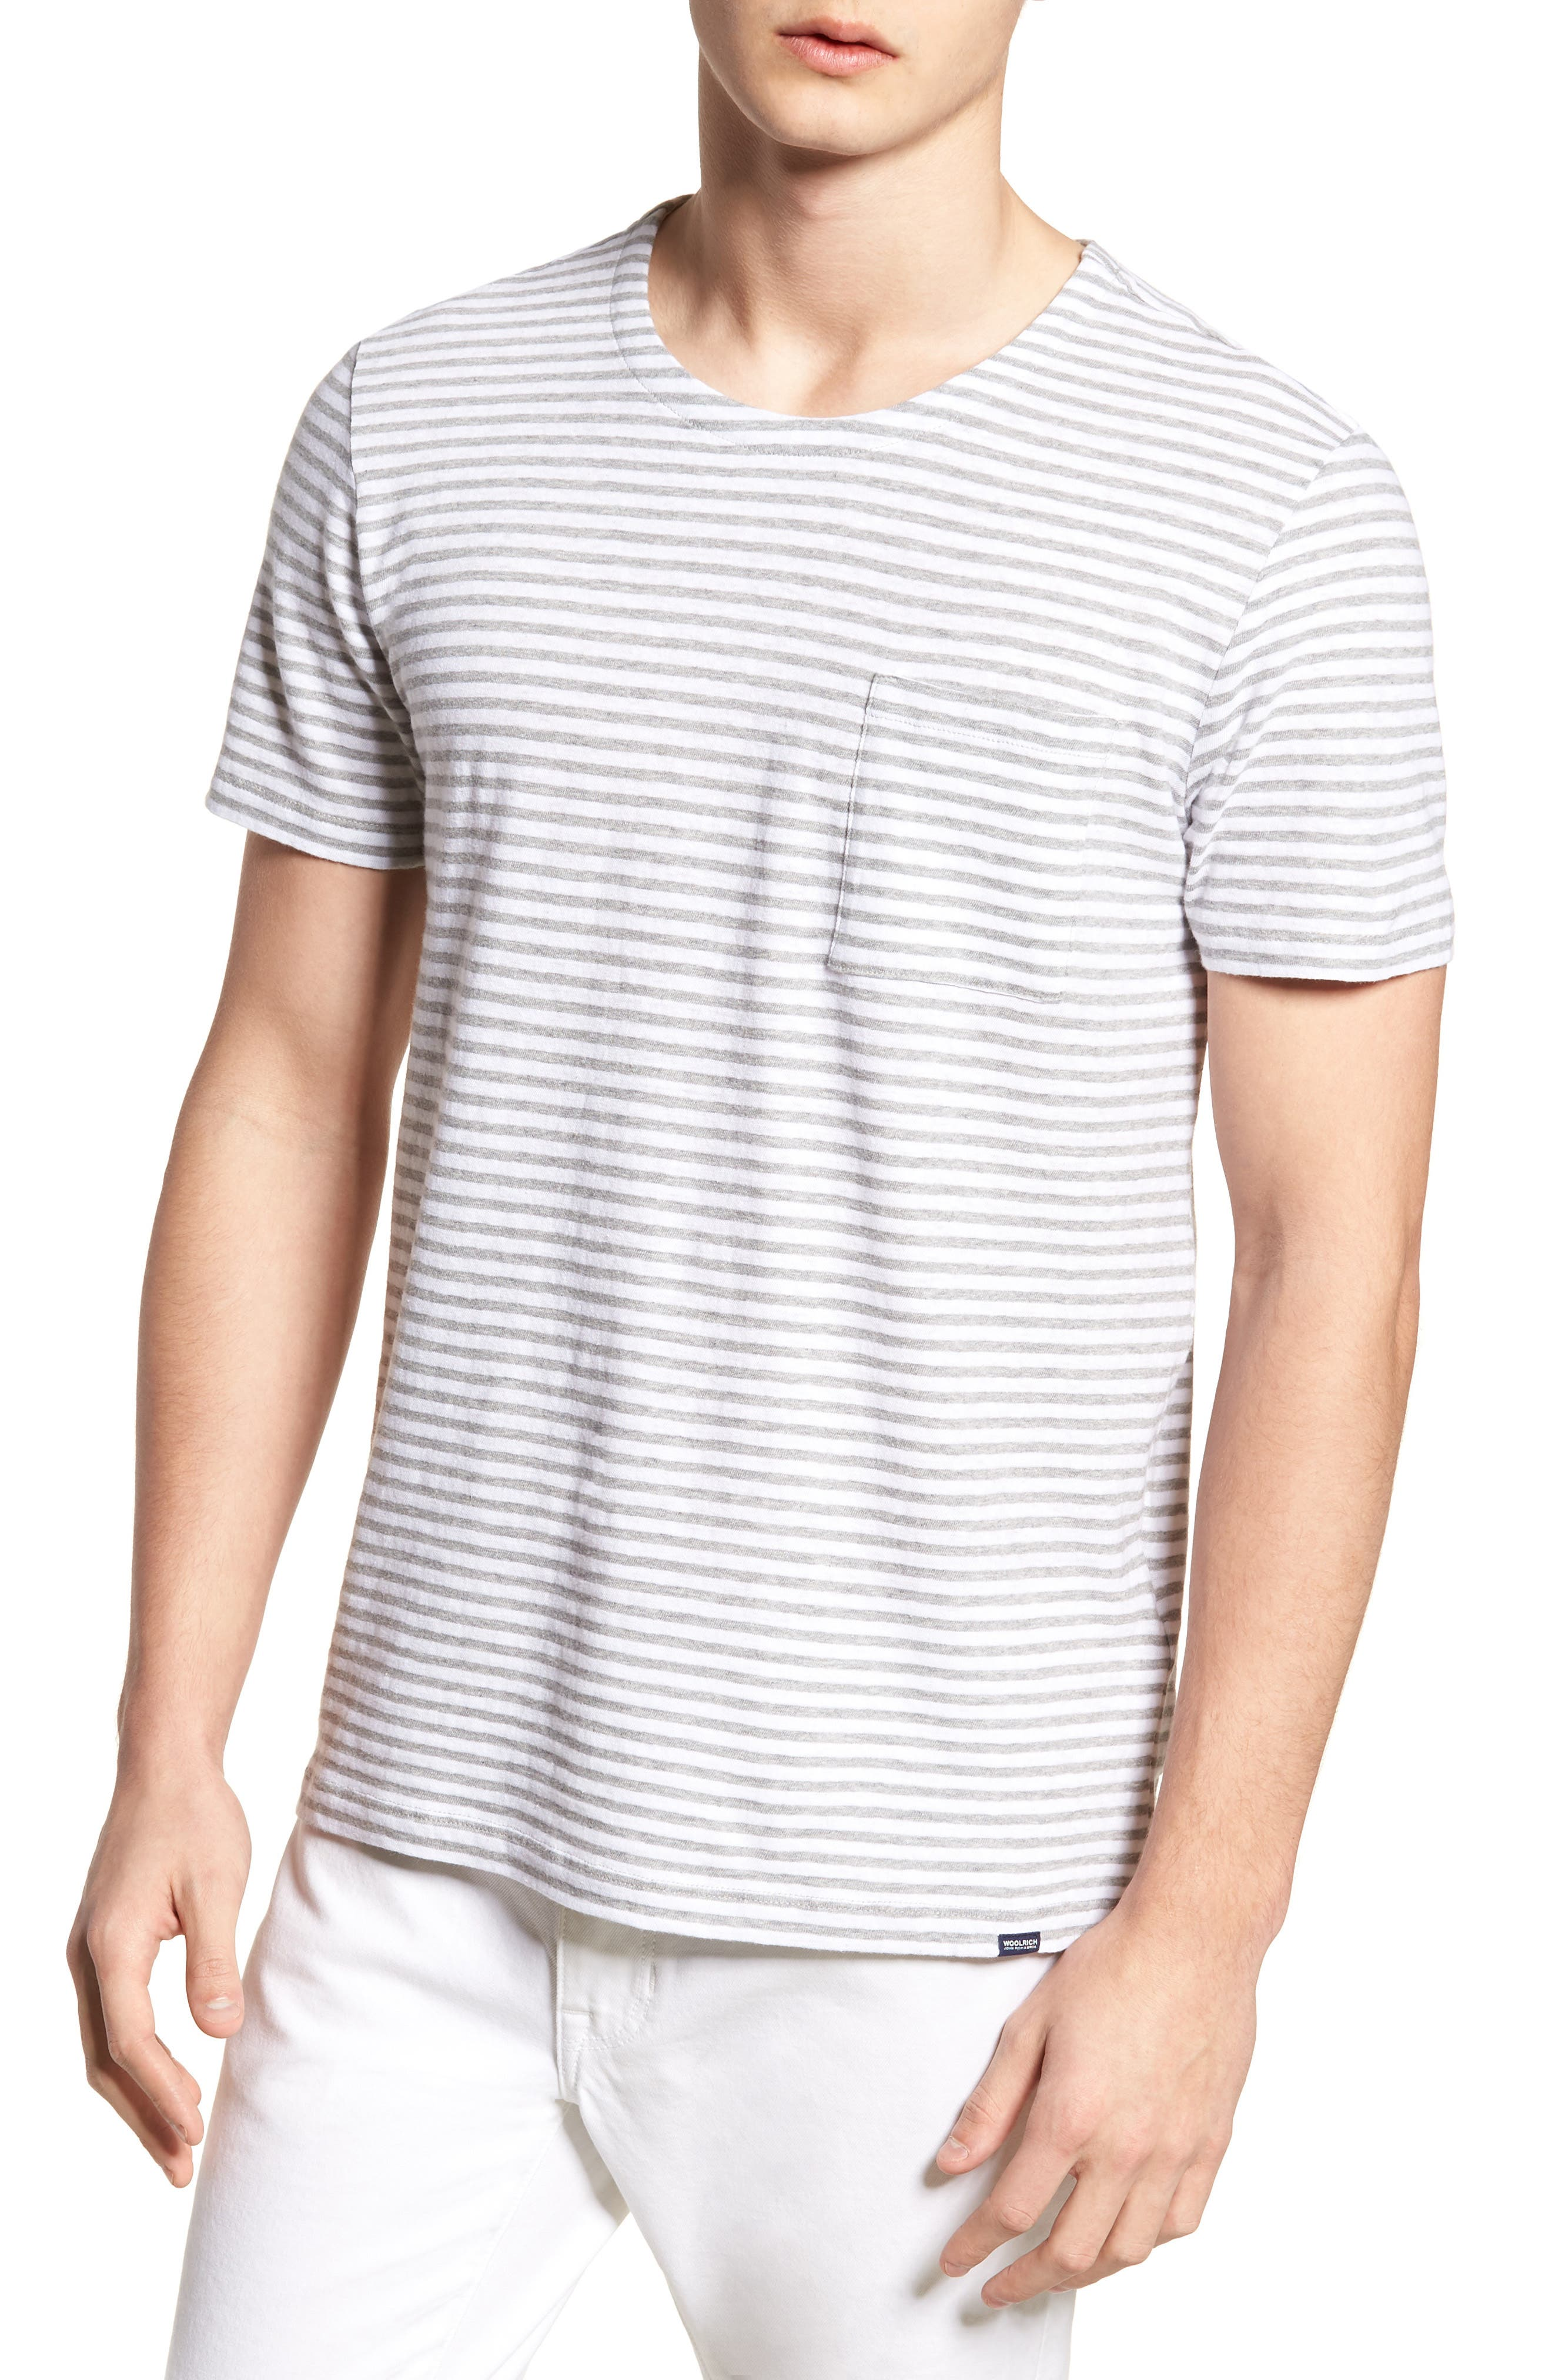 & Bros. Stripe Crewneck T-Shirt,                         Main,                         color, 156